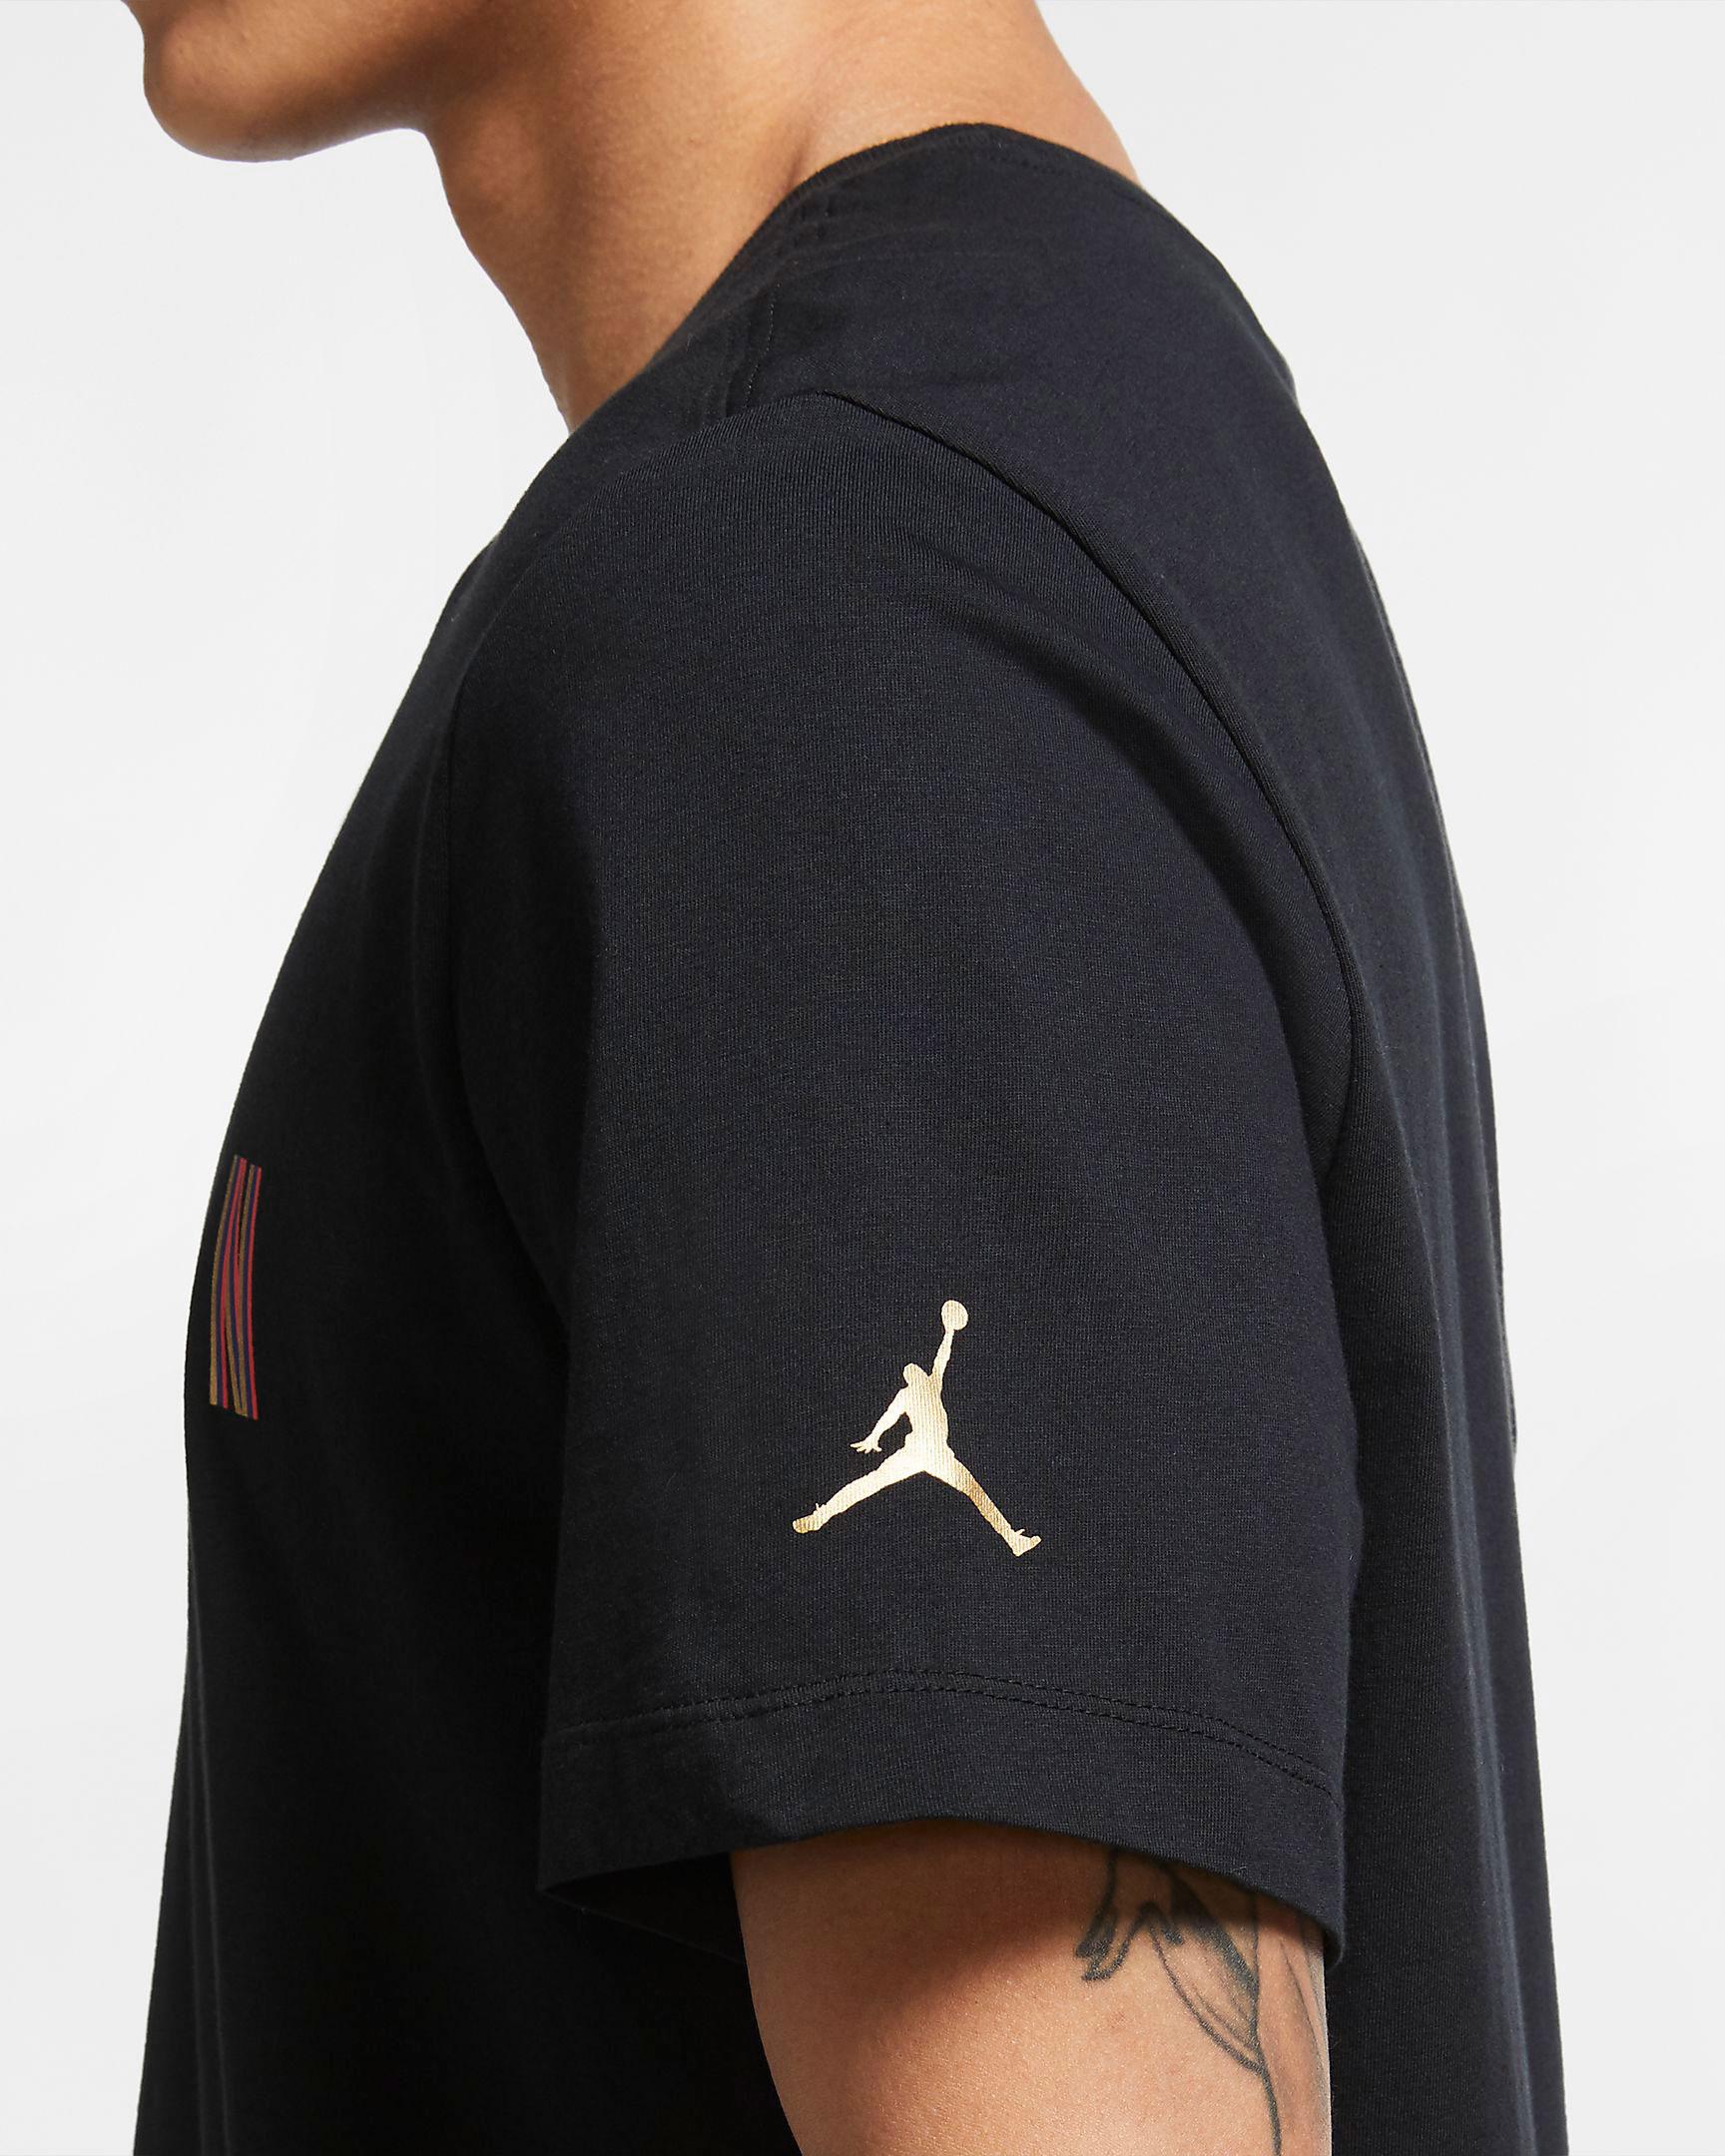 air-jordan-1-low-sweater-nothing-but-net-shirt-match-2